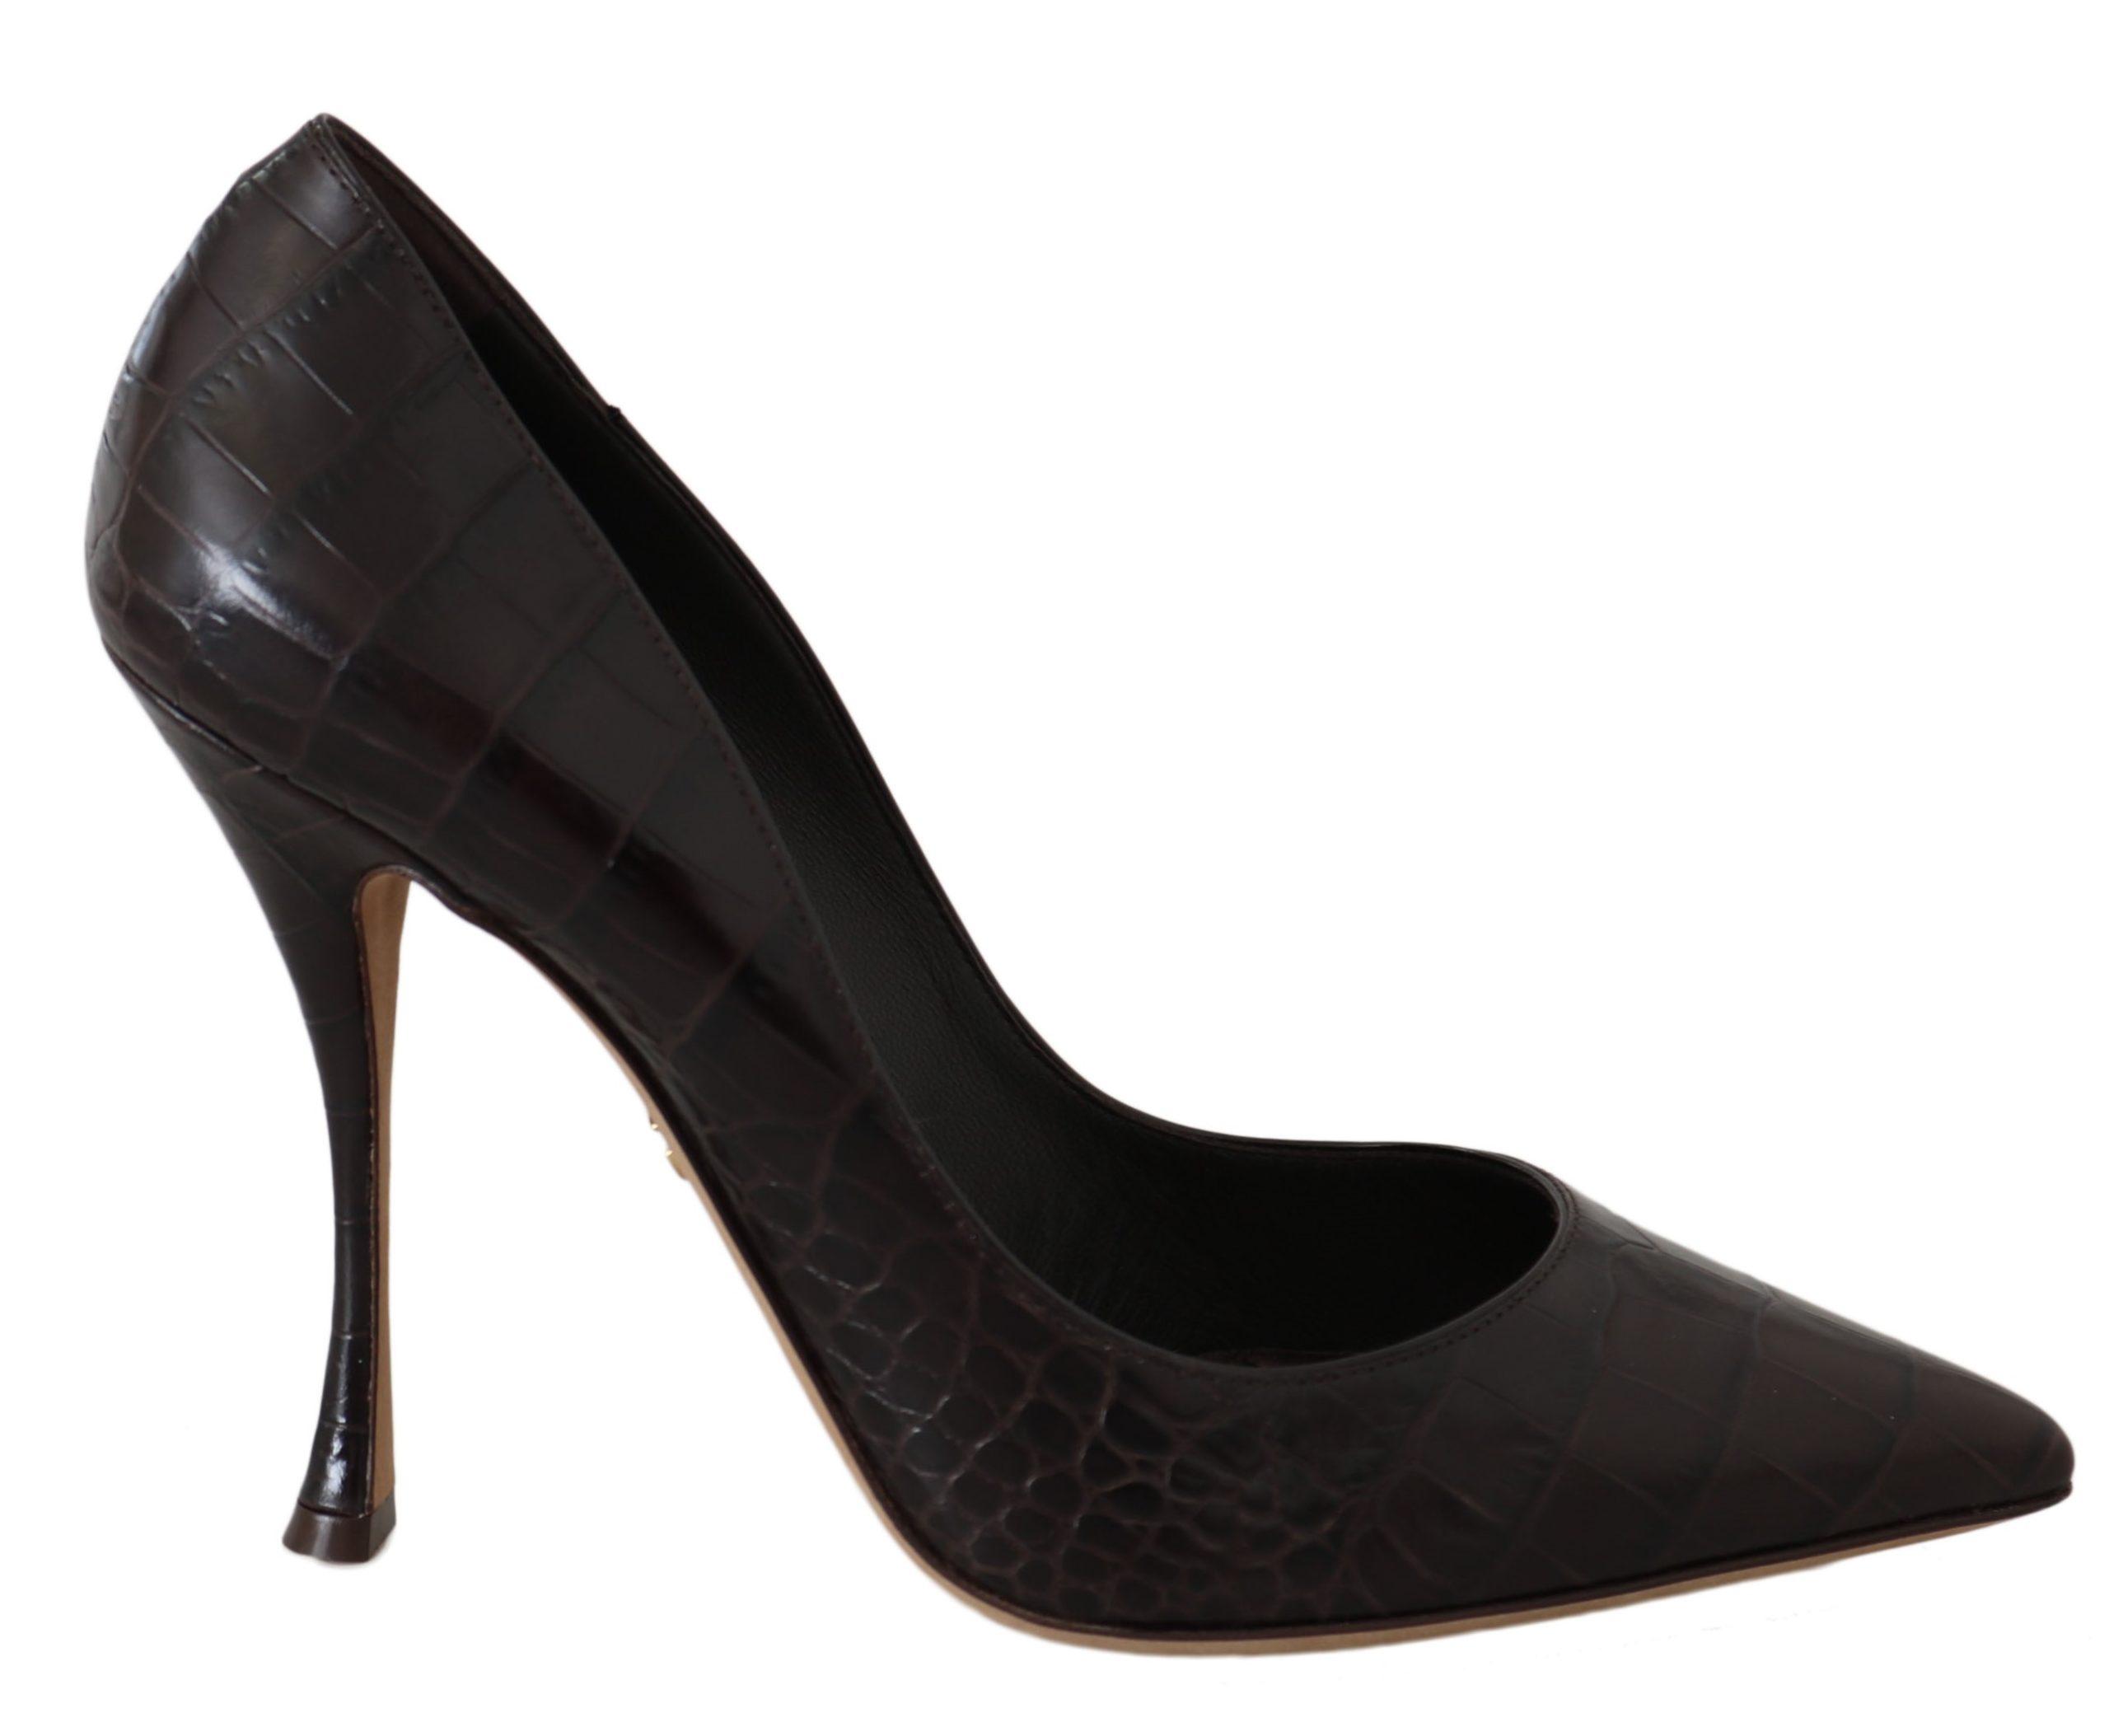 Dolce & Gabbana Women's Leather Heels Pumps Heels Shoes LA5985 - EU35/US4.5